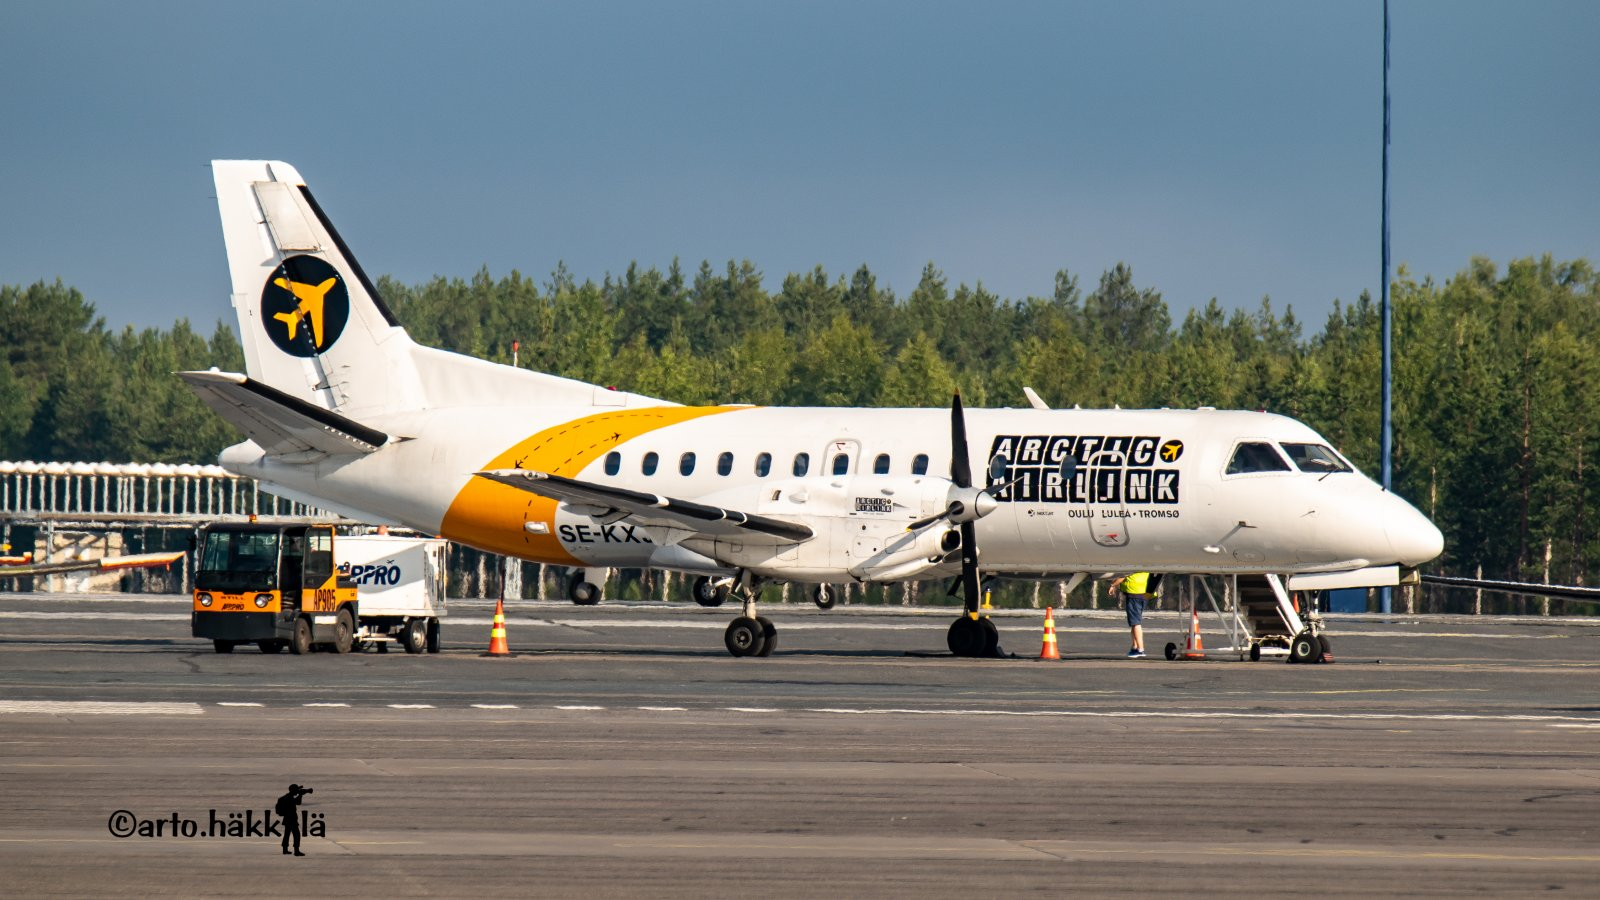 Saab 340 - MSN 189 - SE-KXJ  Last Airline Nextjet Oulussa